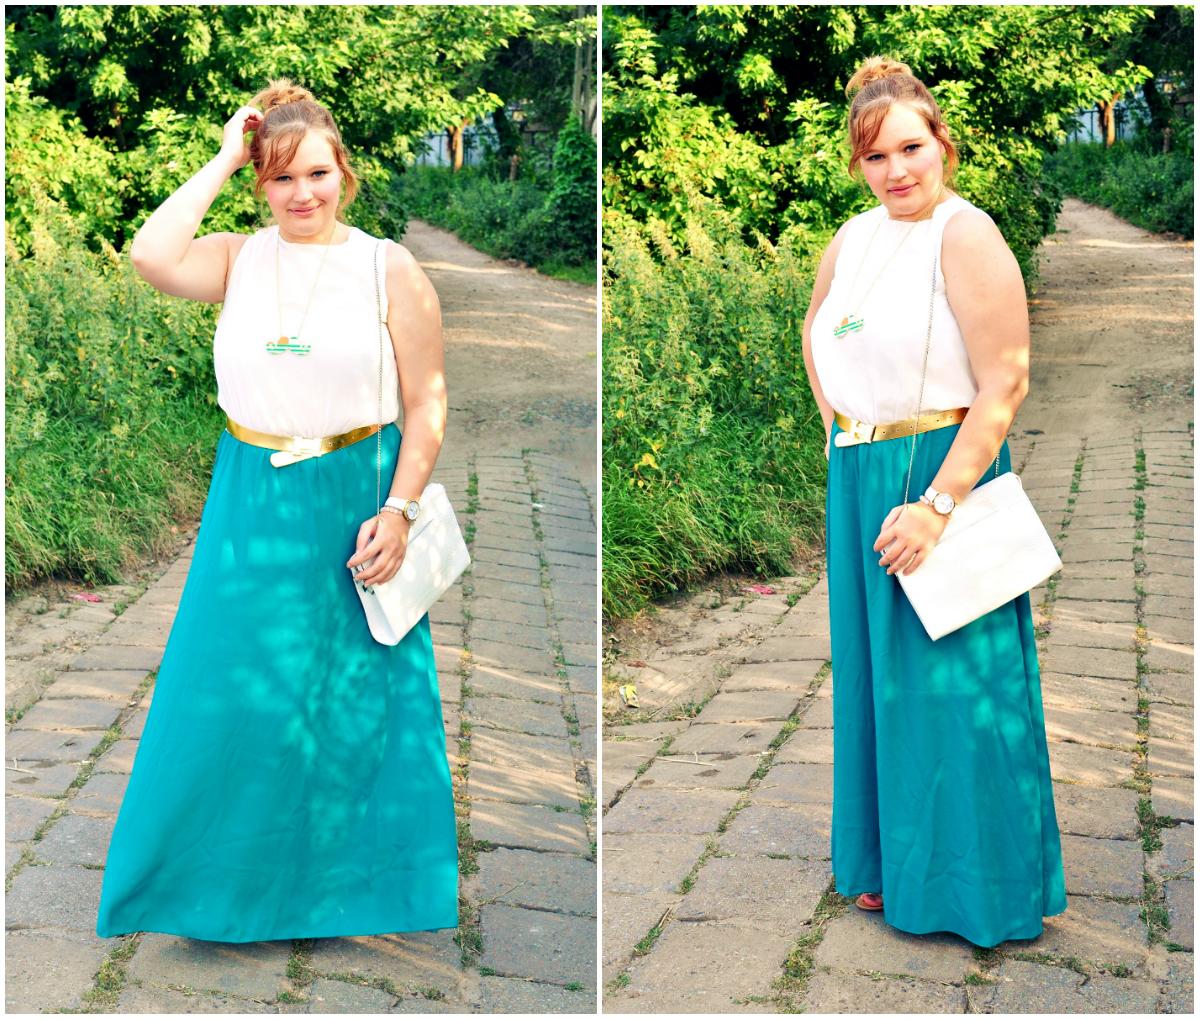 Długa Sukienka Na Lato Kasia Koniakowska Blog